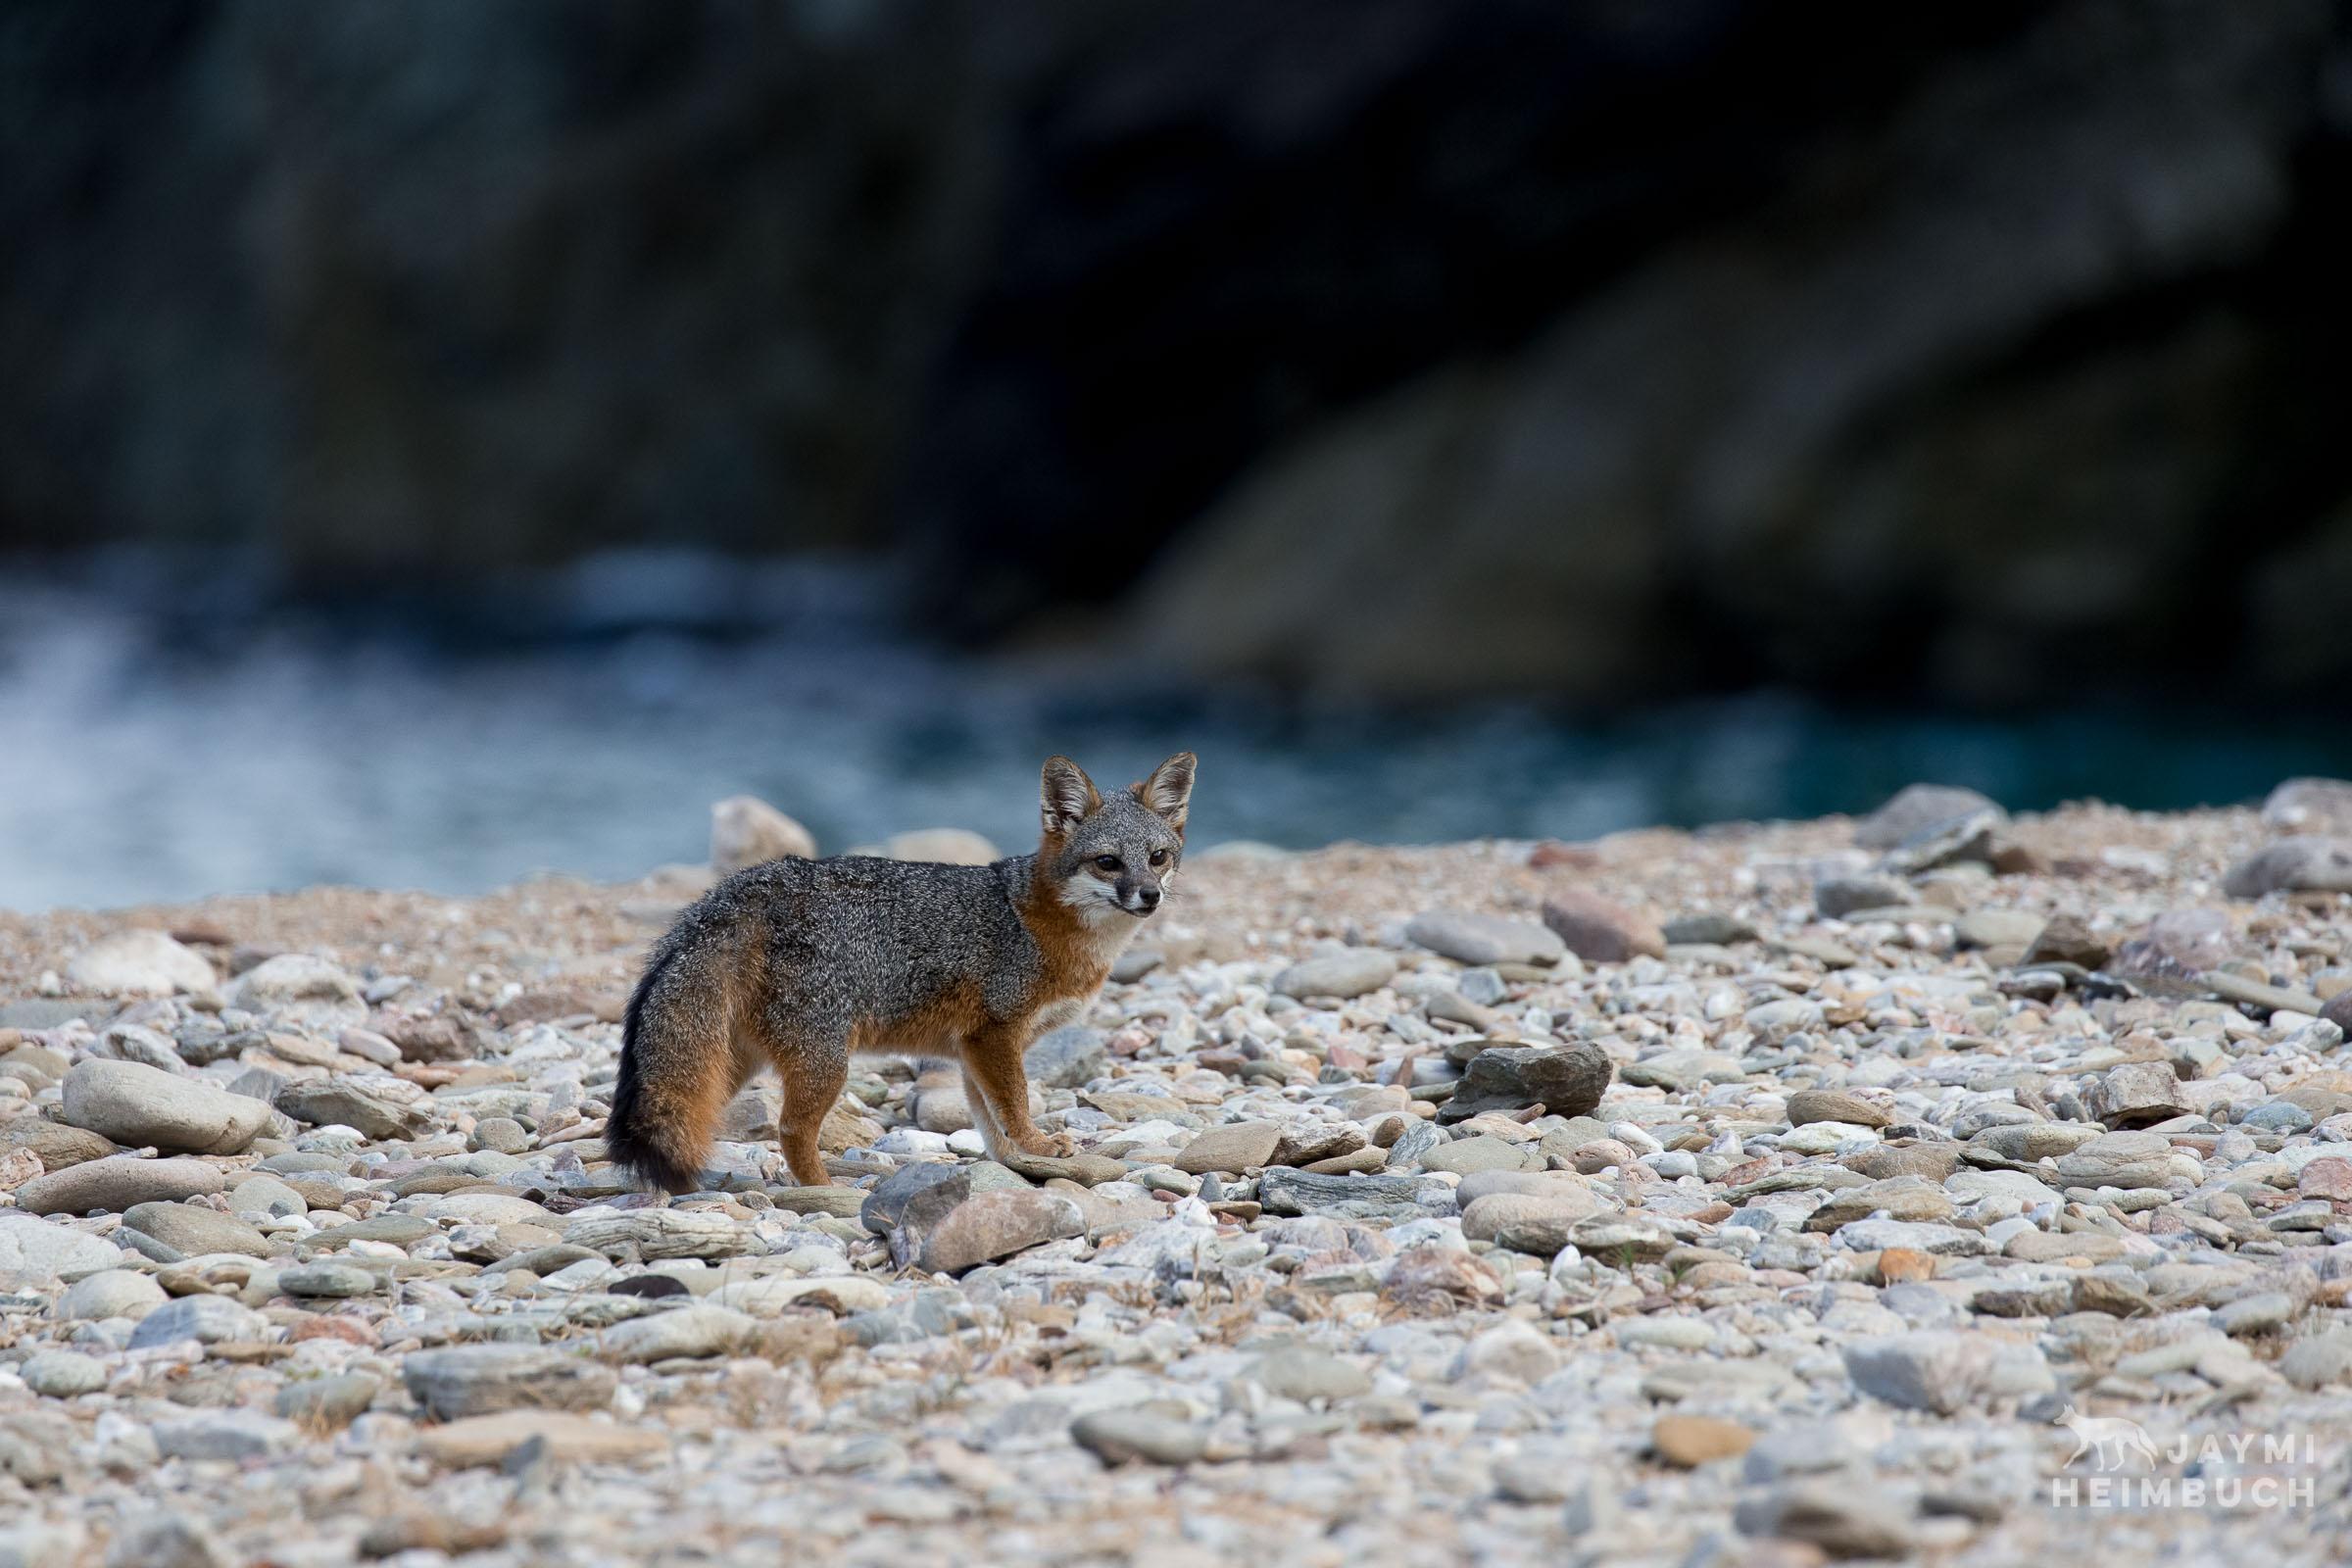 channel-island-gray-fox-research-jaymi-heimbuch-_JHX8360-02